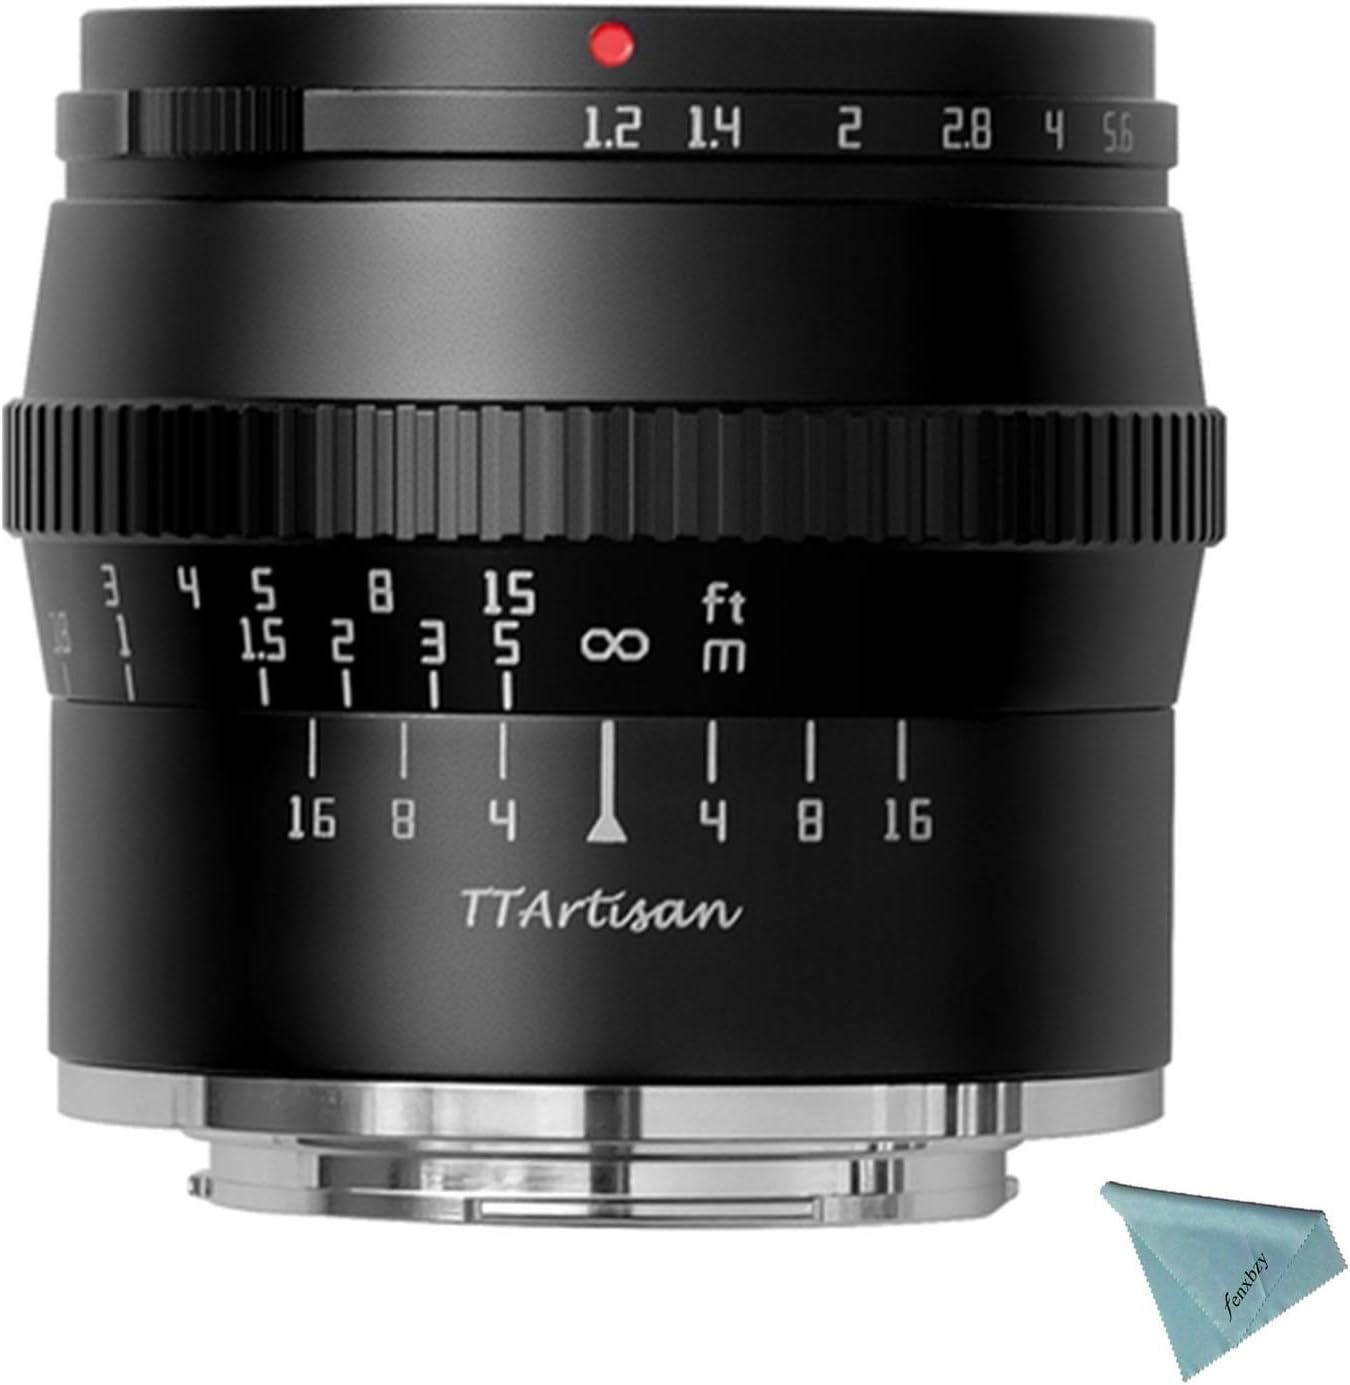 Nippon regular agency TTArtisan 50mm F1.2 APS-C Manual Large discharge sale Olymp Lens for Panasonic Focus